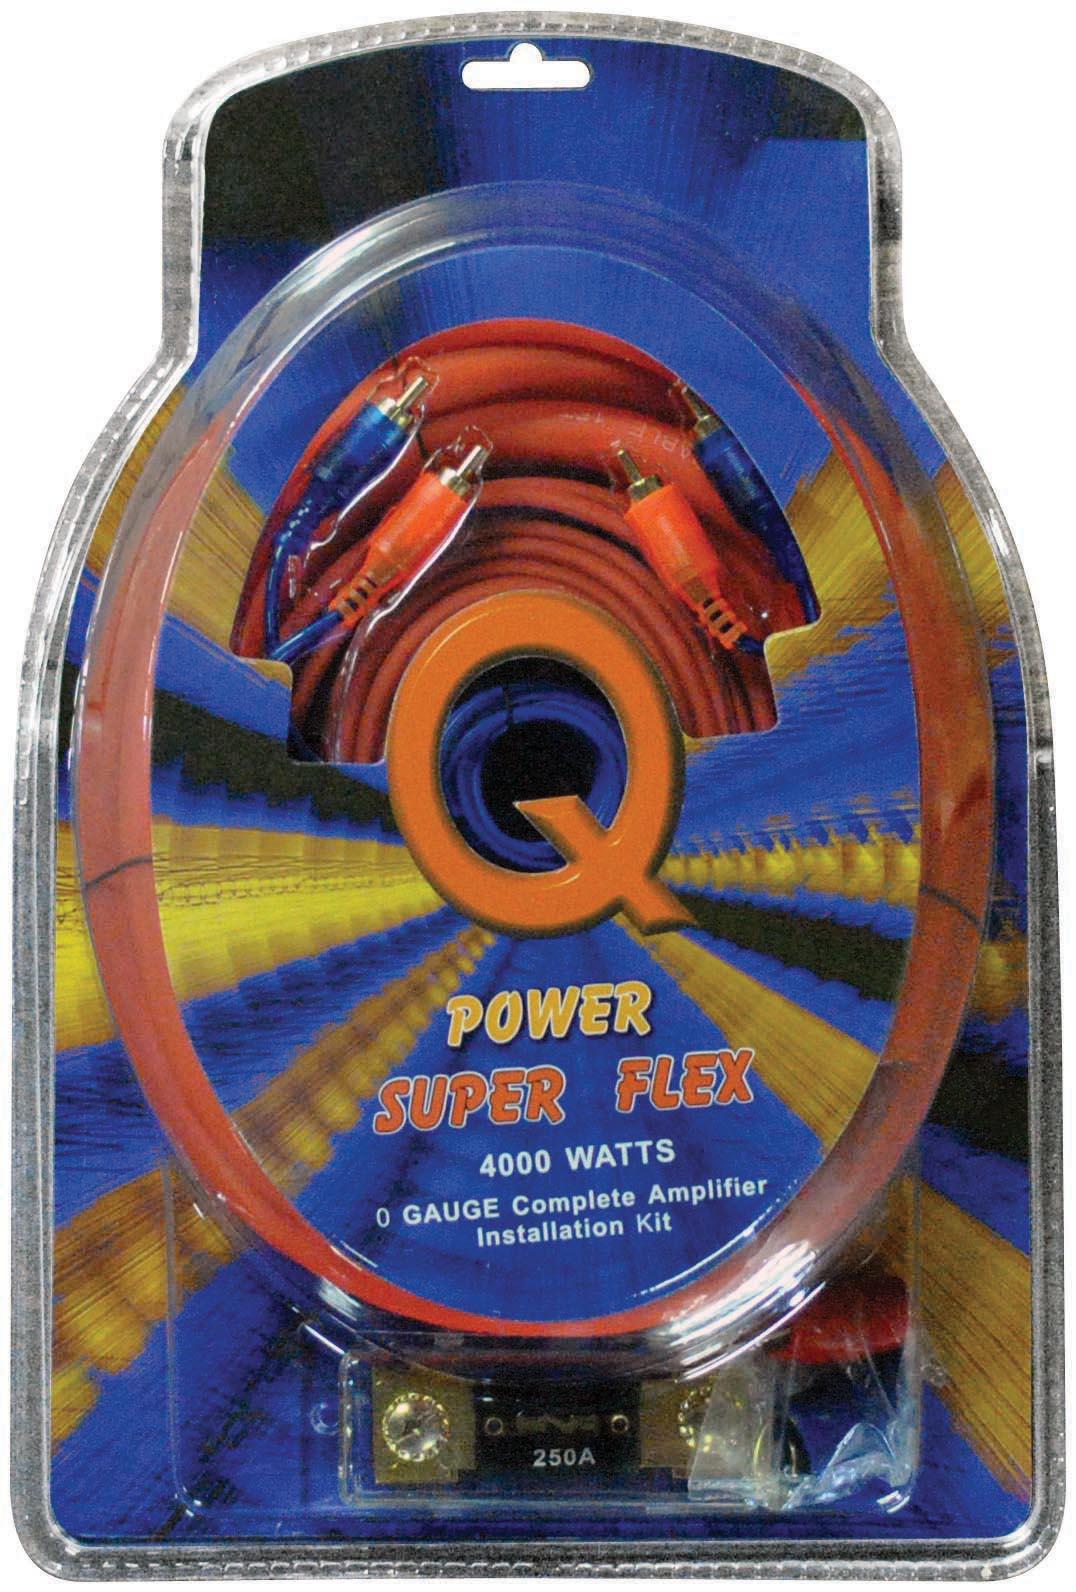 Qpower 0 Gauge Amp Kit Super Flex